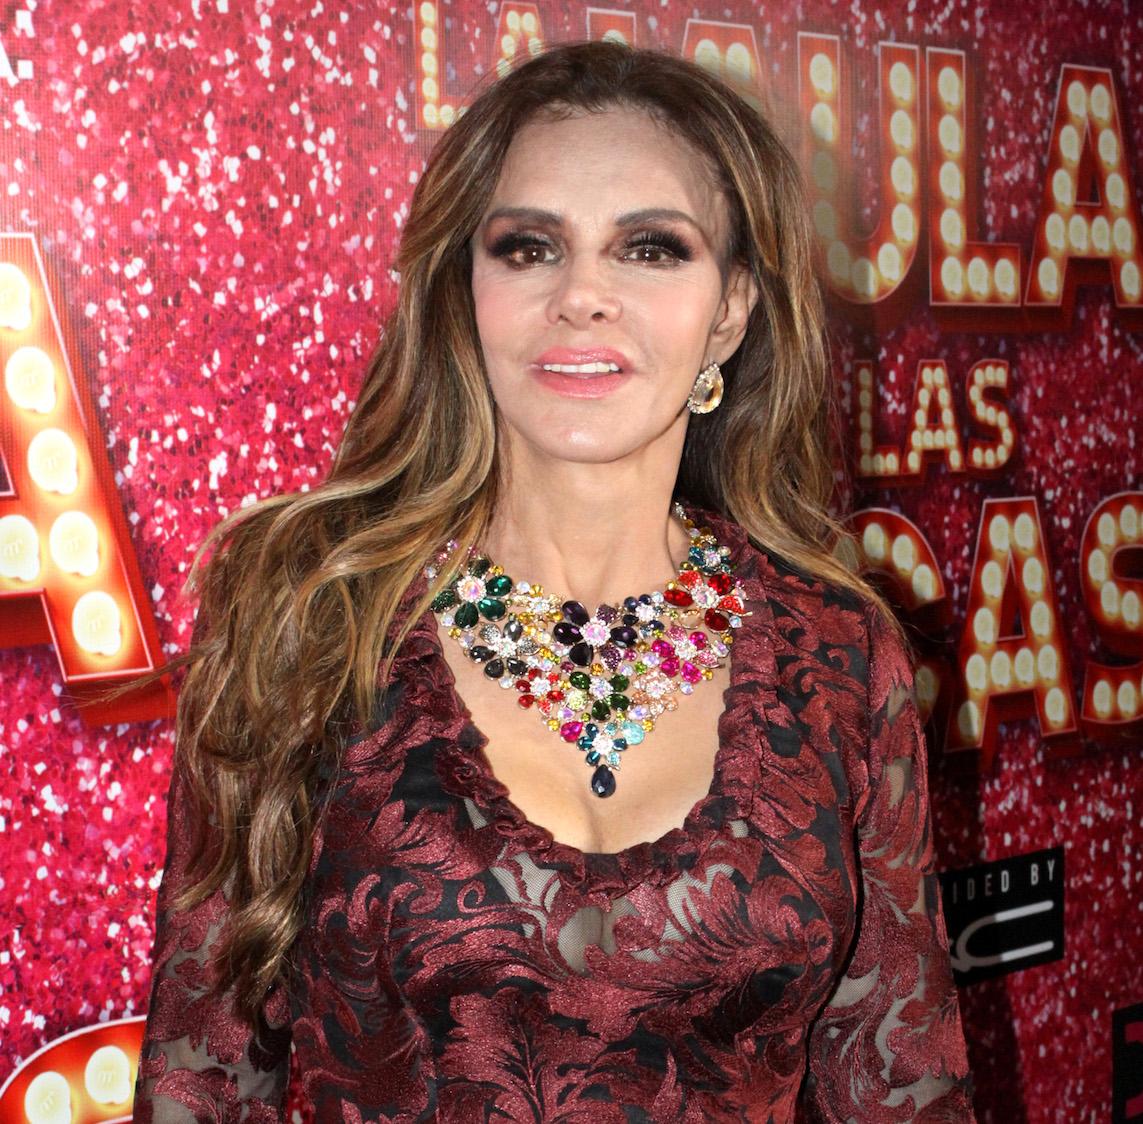 Lucía Méndez casi muere al lado de Cantinflas - WALU.TV